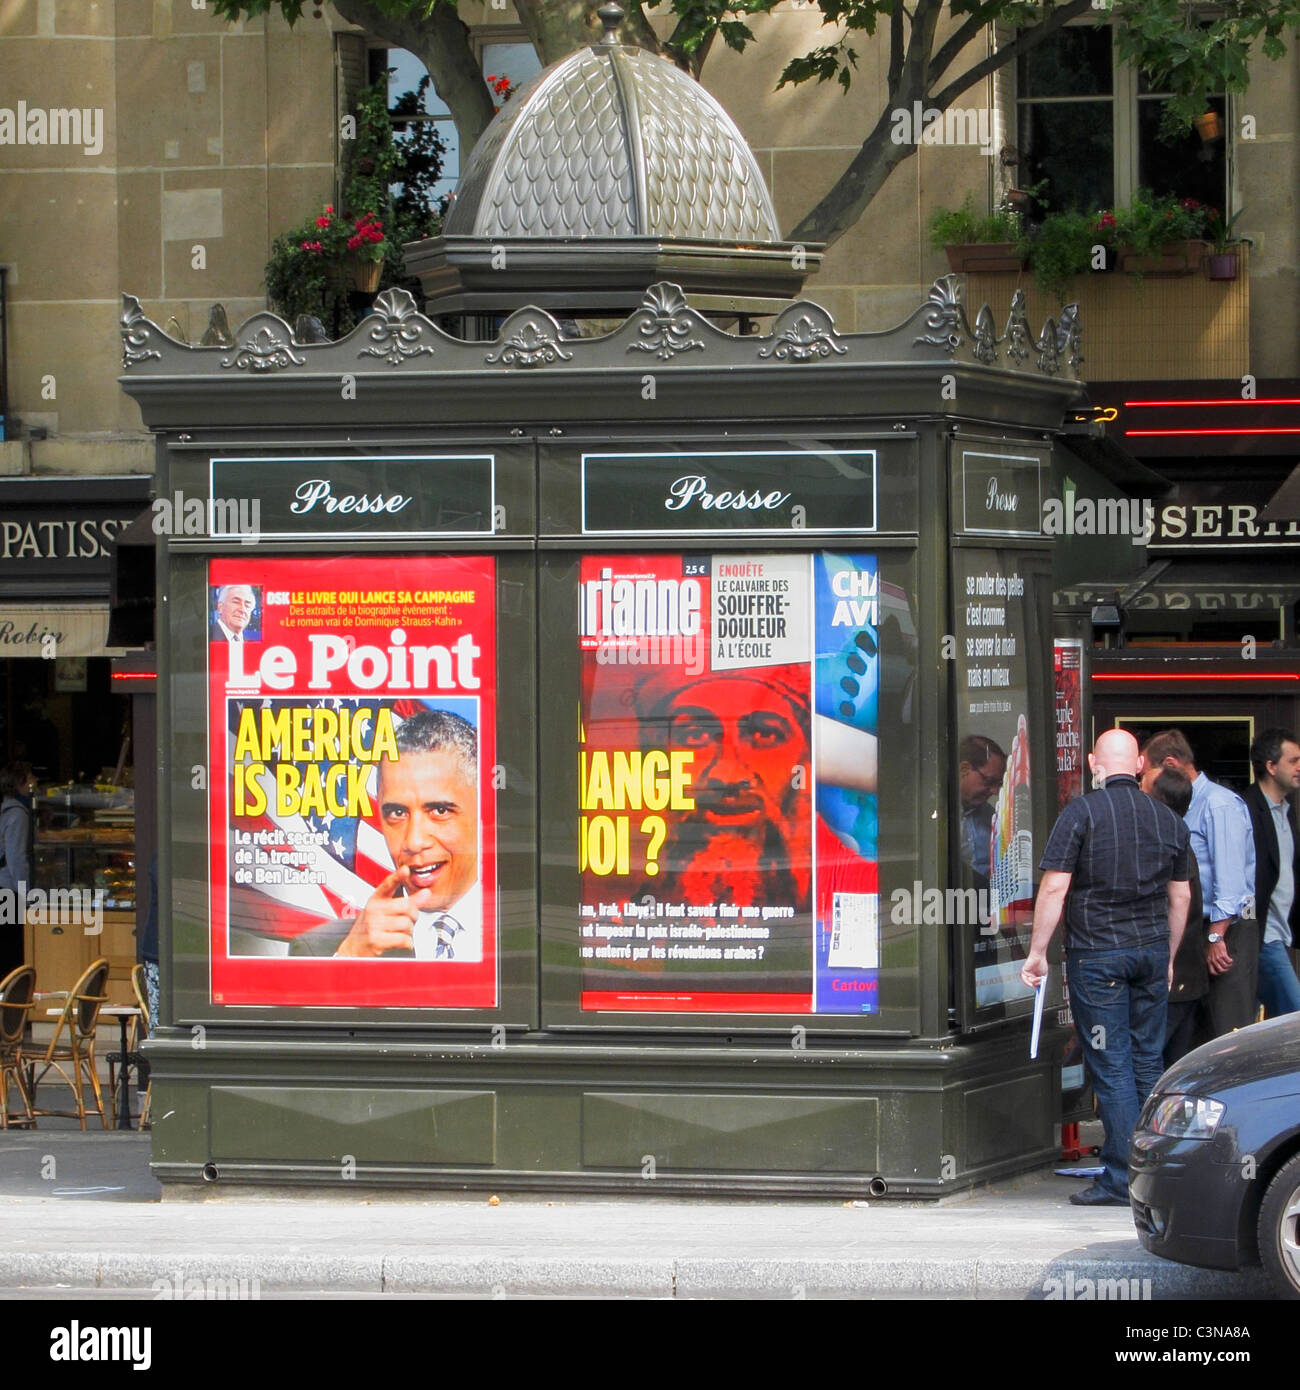 Paris, France, French Advertising on News kiosk on Street, Obama Magazine Cover - Stock Image